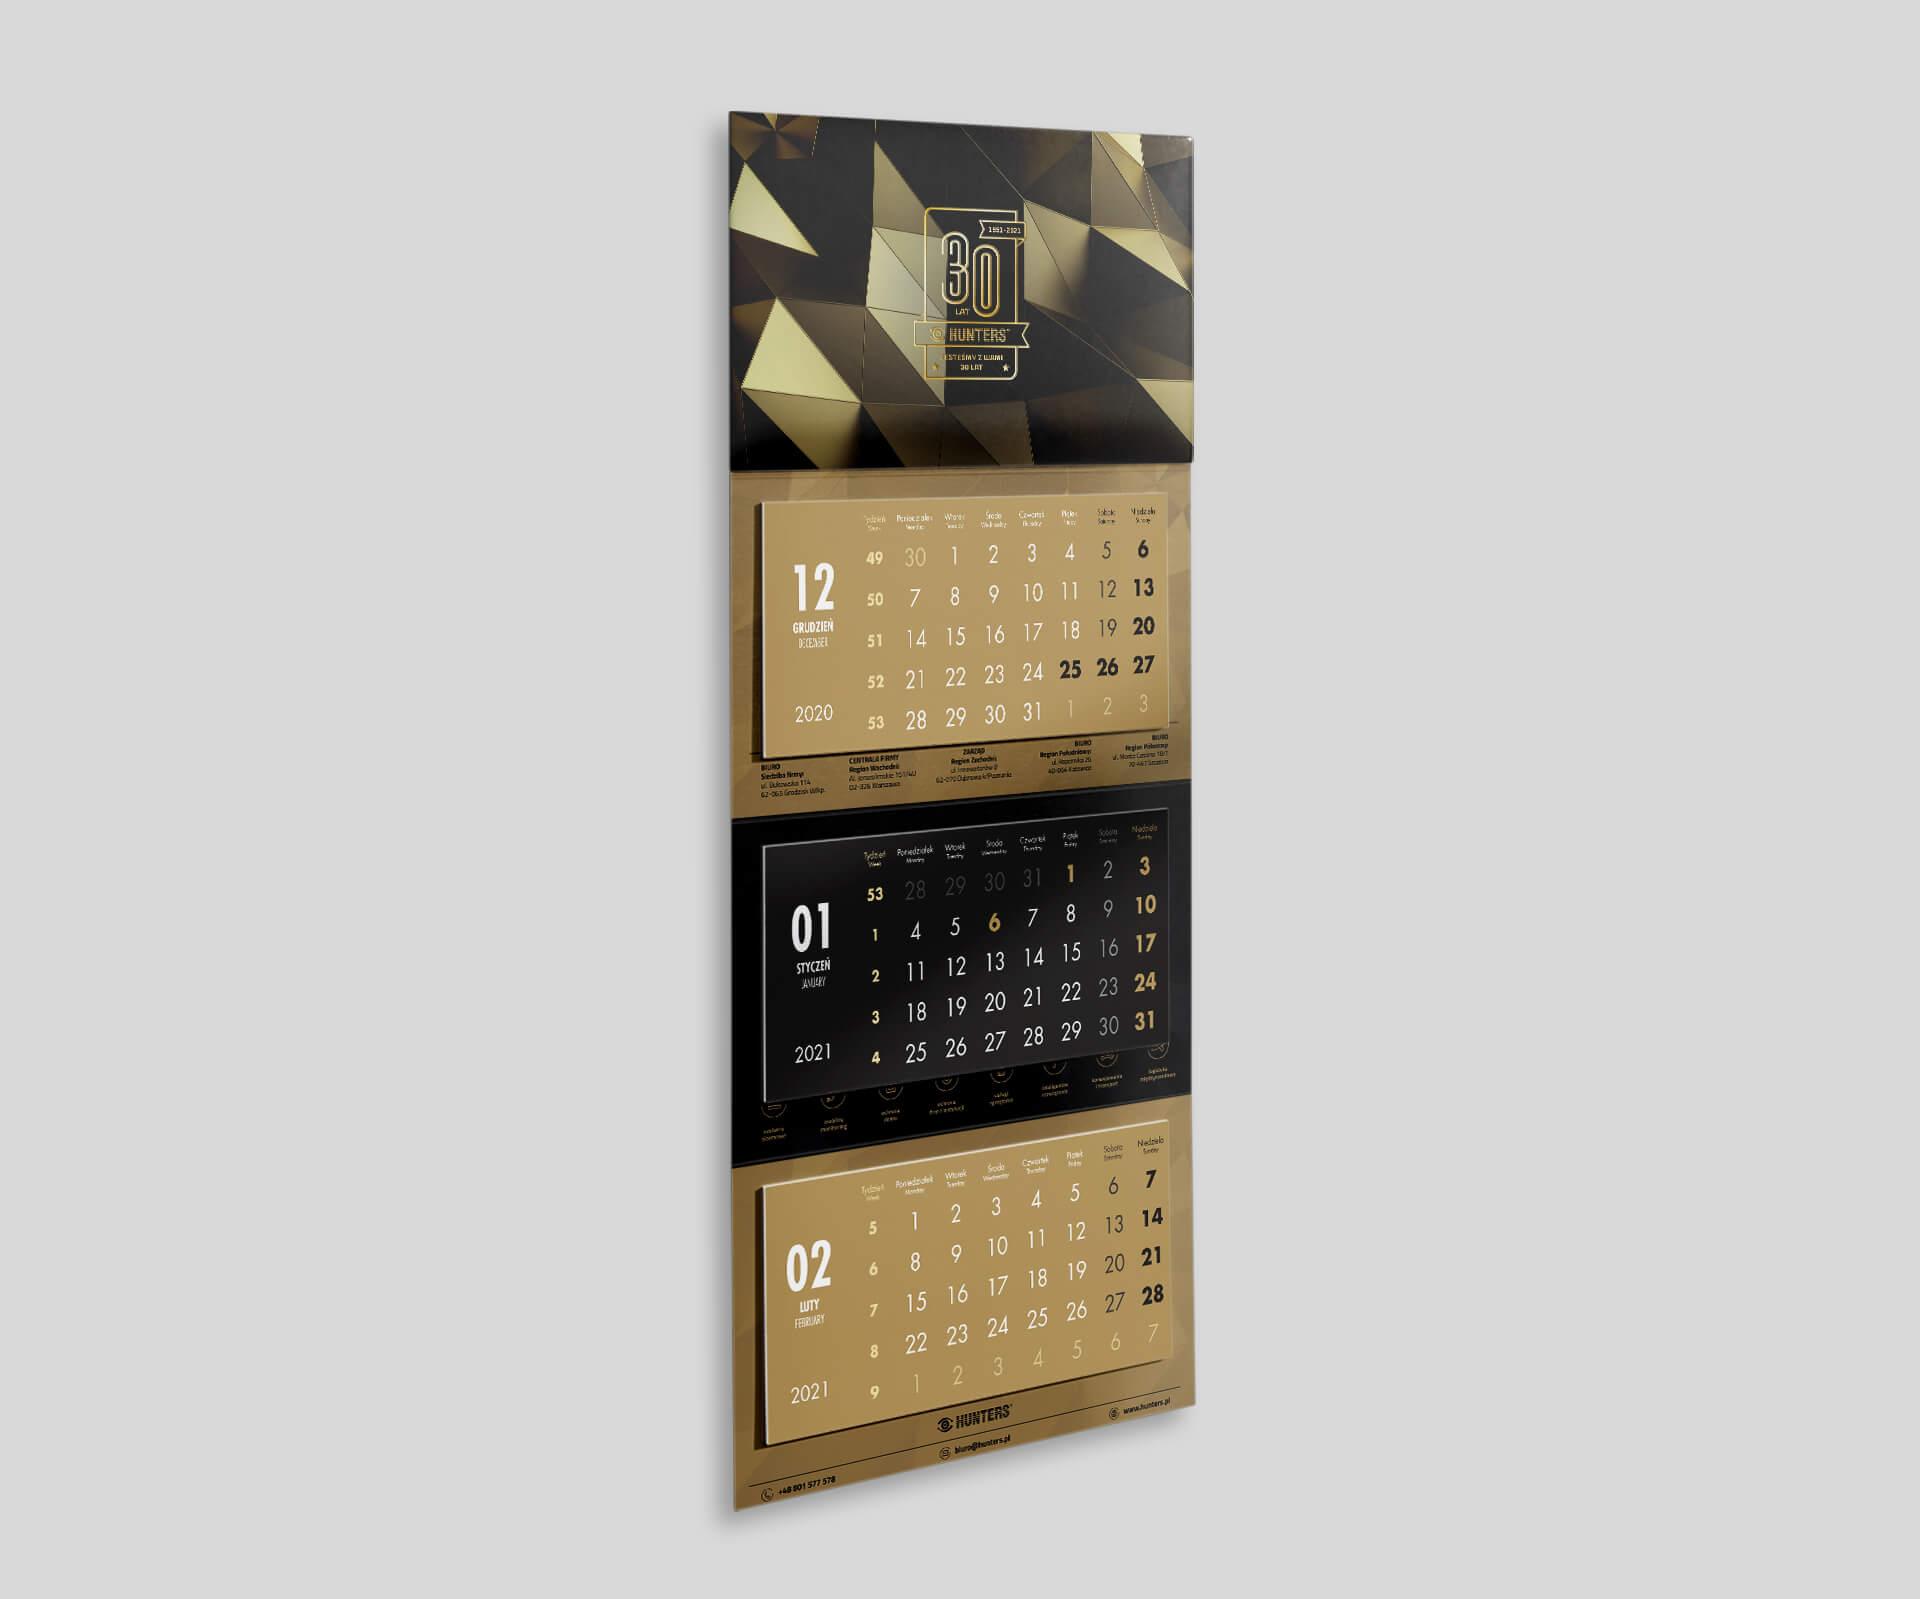 kalendarze ścienne 2021